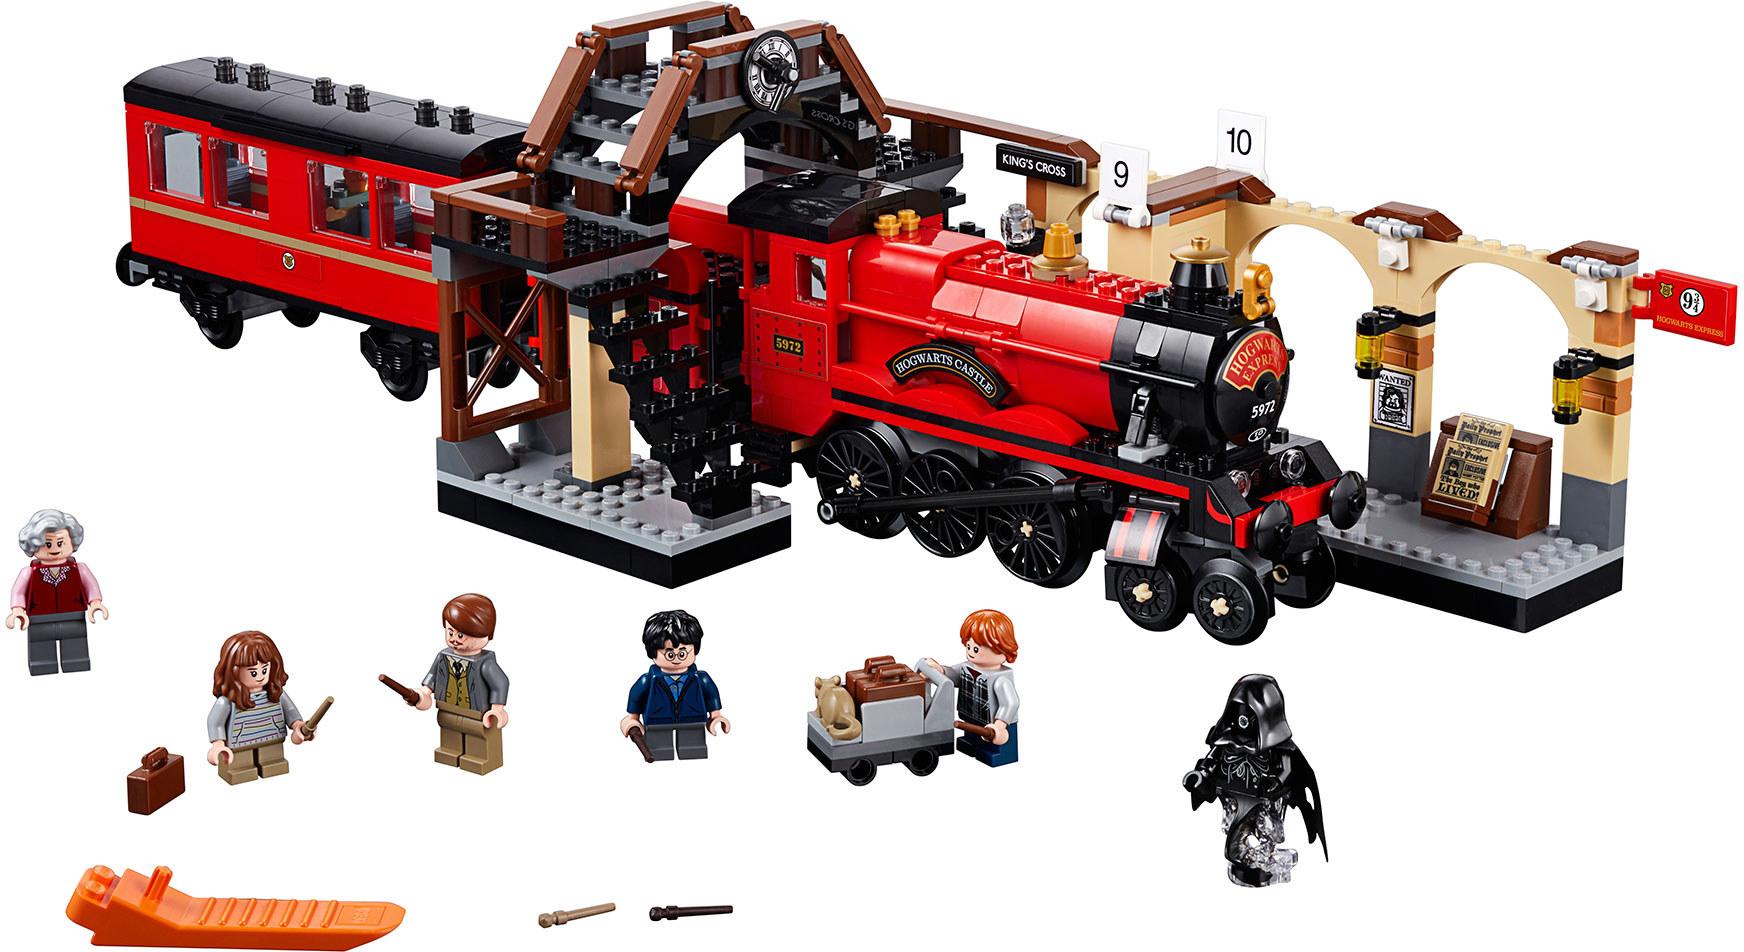 lego hogwarts express overview